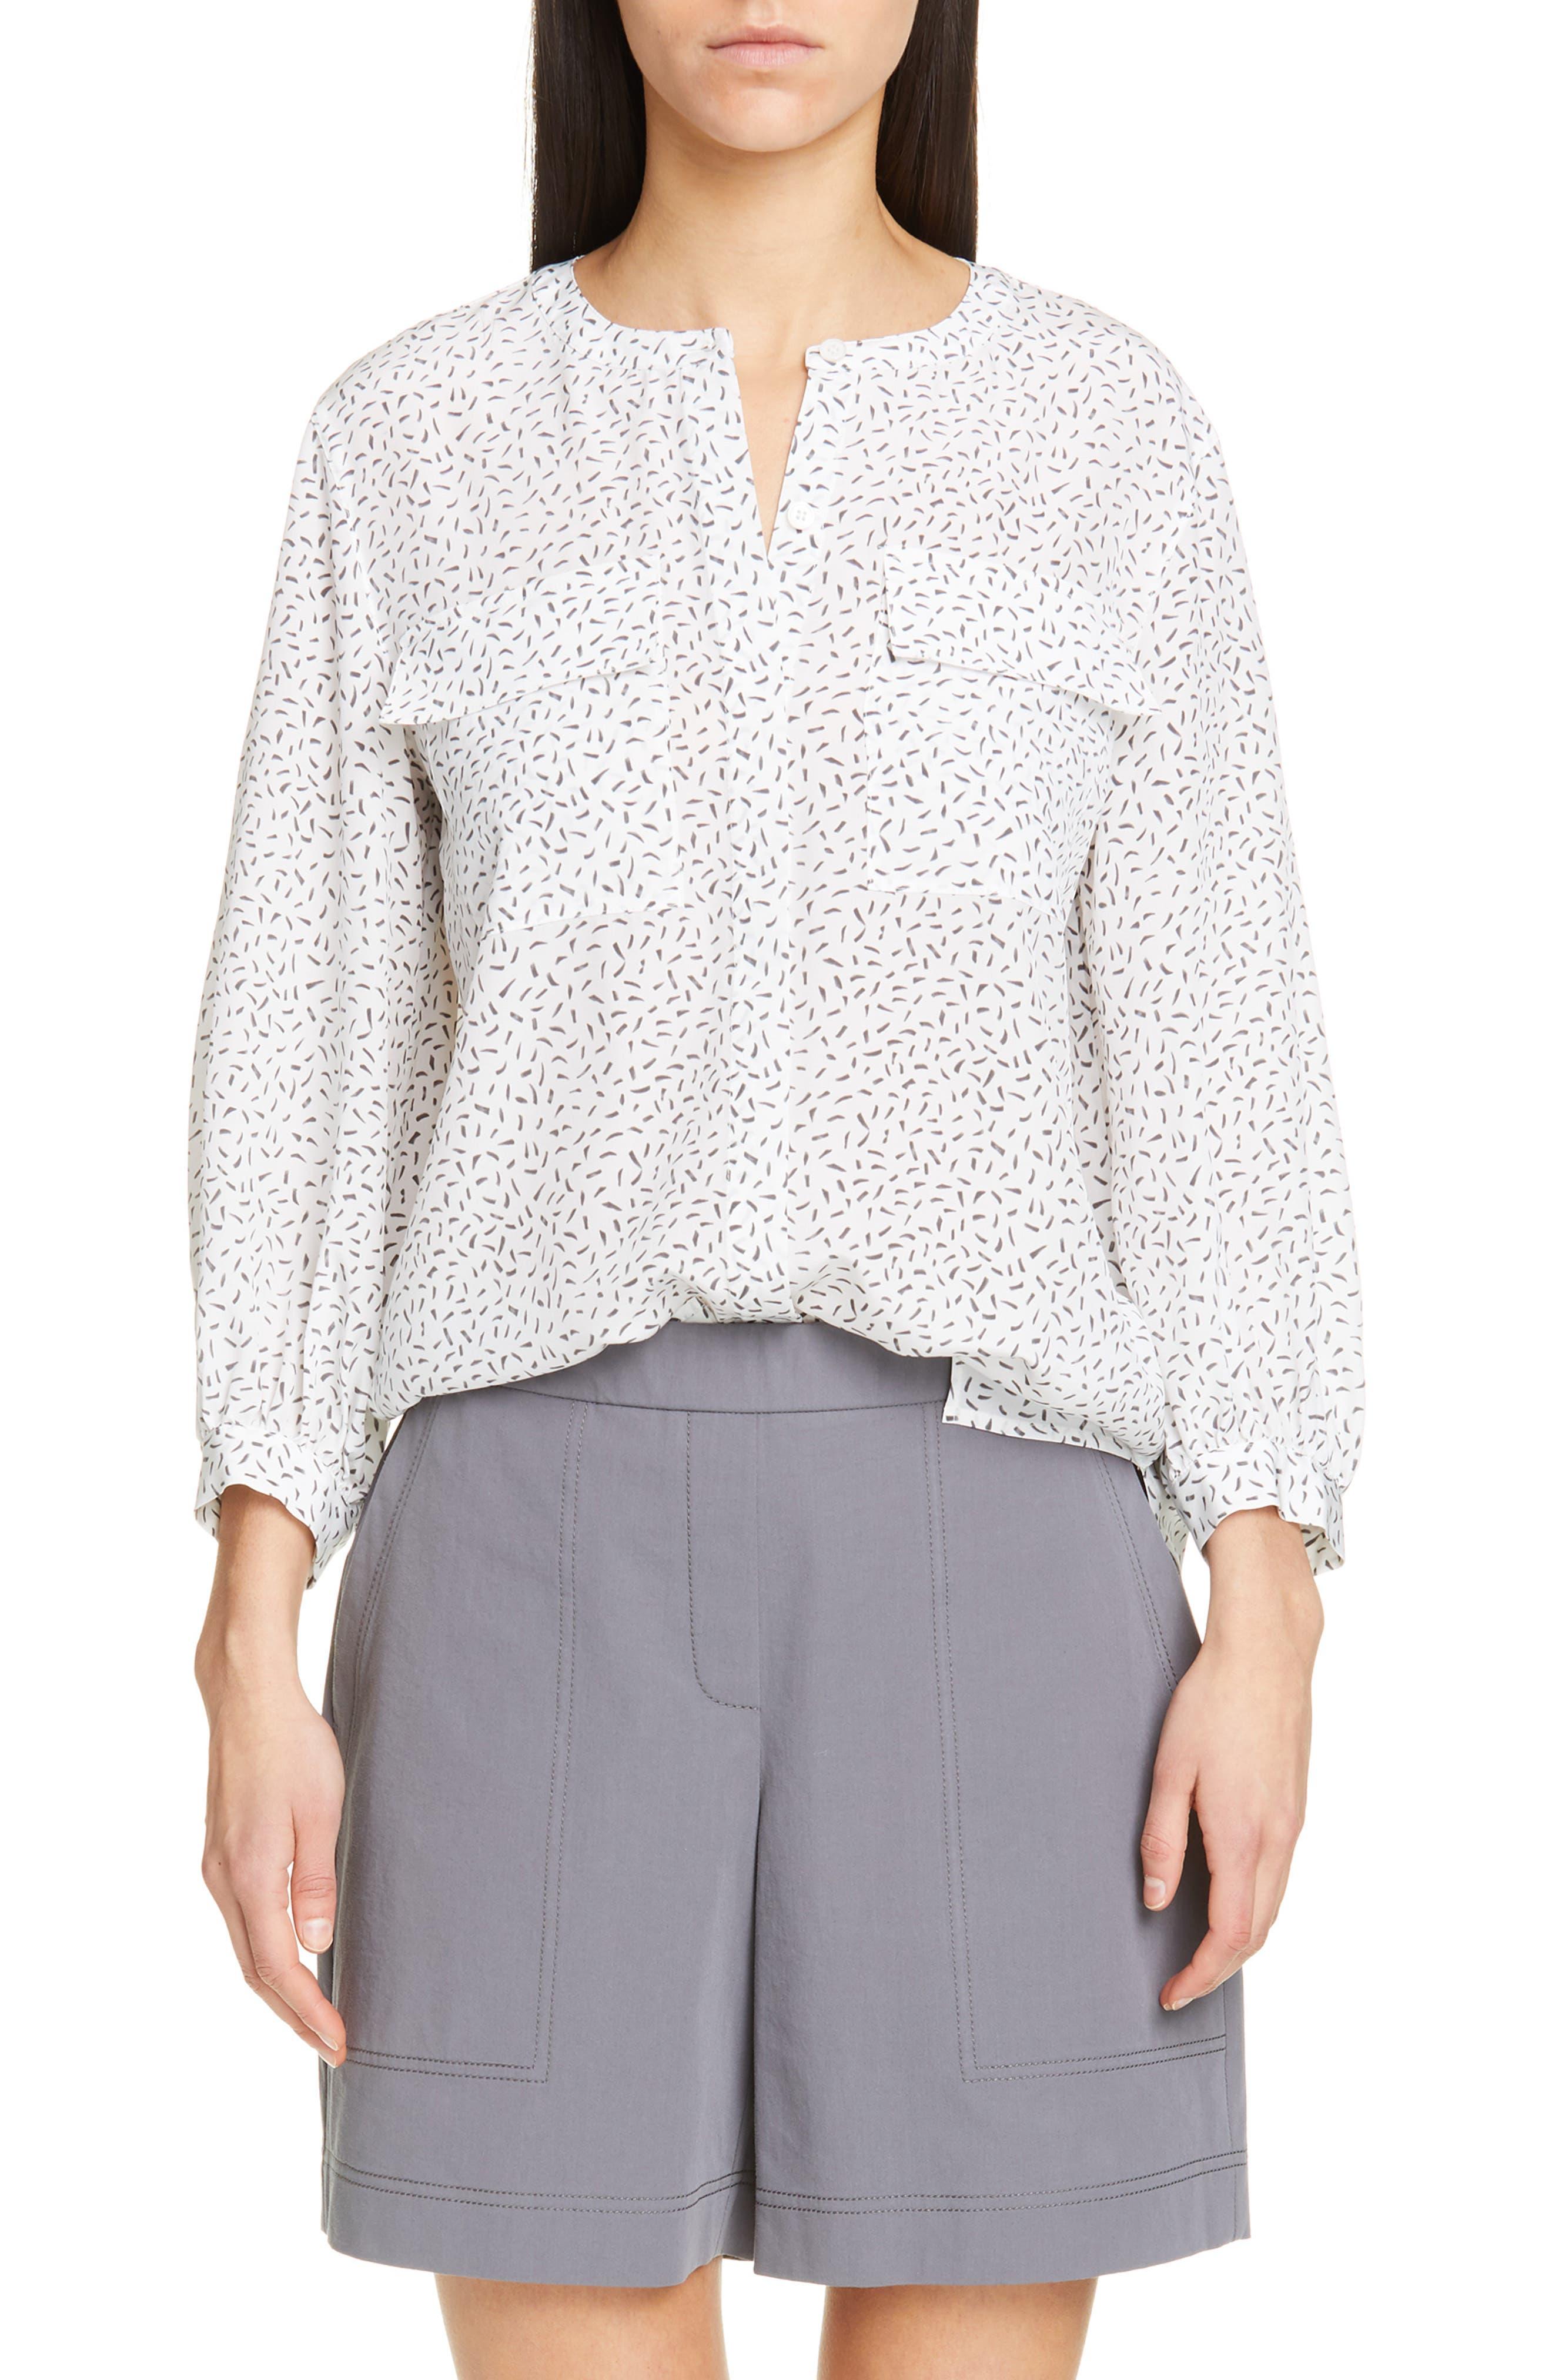 LAFAYETTE 148 NEW YORK Liberty Silk Blouse, Main, color, WHITE MULTI